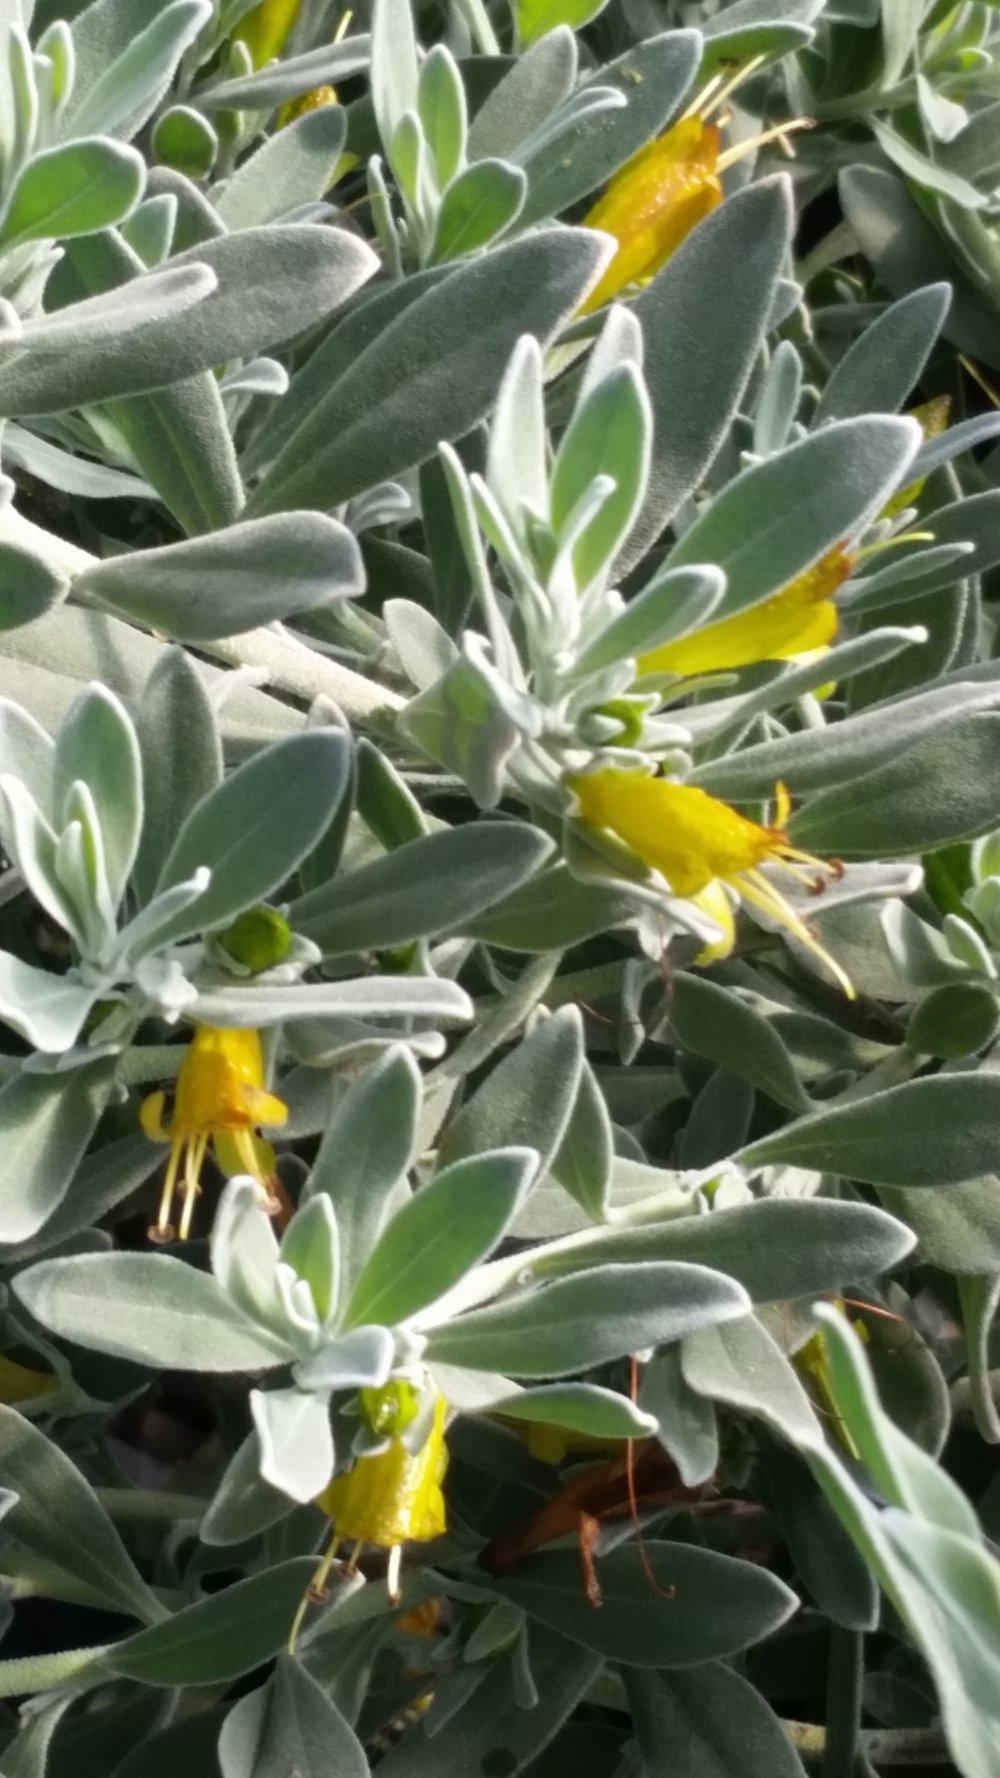 Eremophila glabra kalgoorlie - Kalgoorlie Gold™